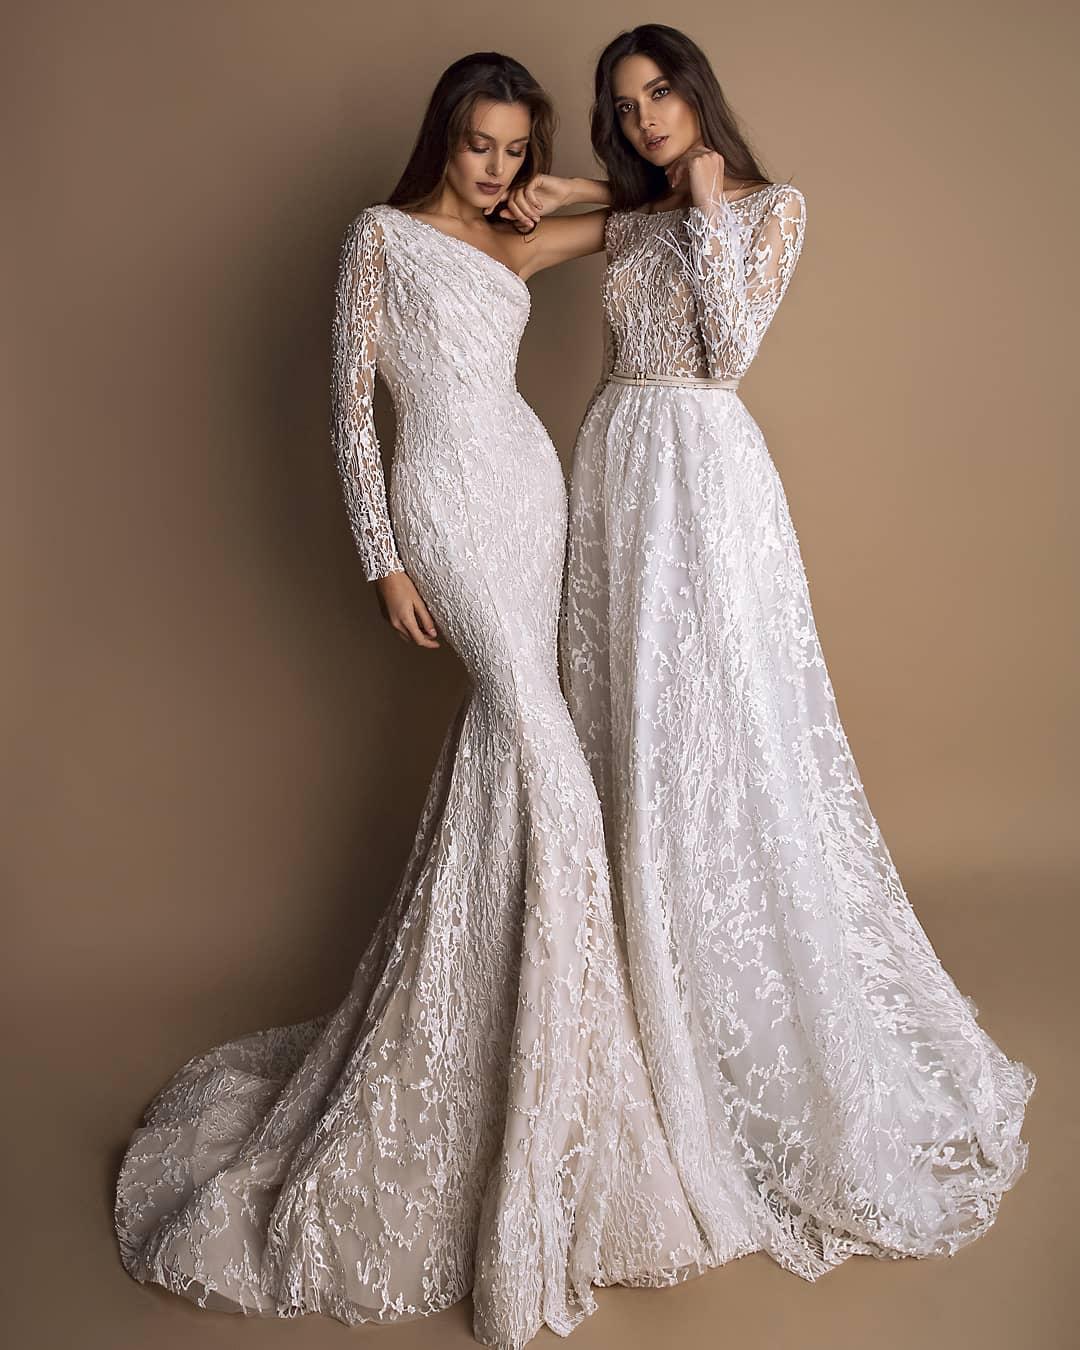 Wedding dresses Demi and Eveline